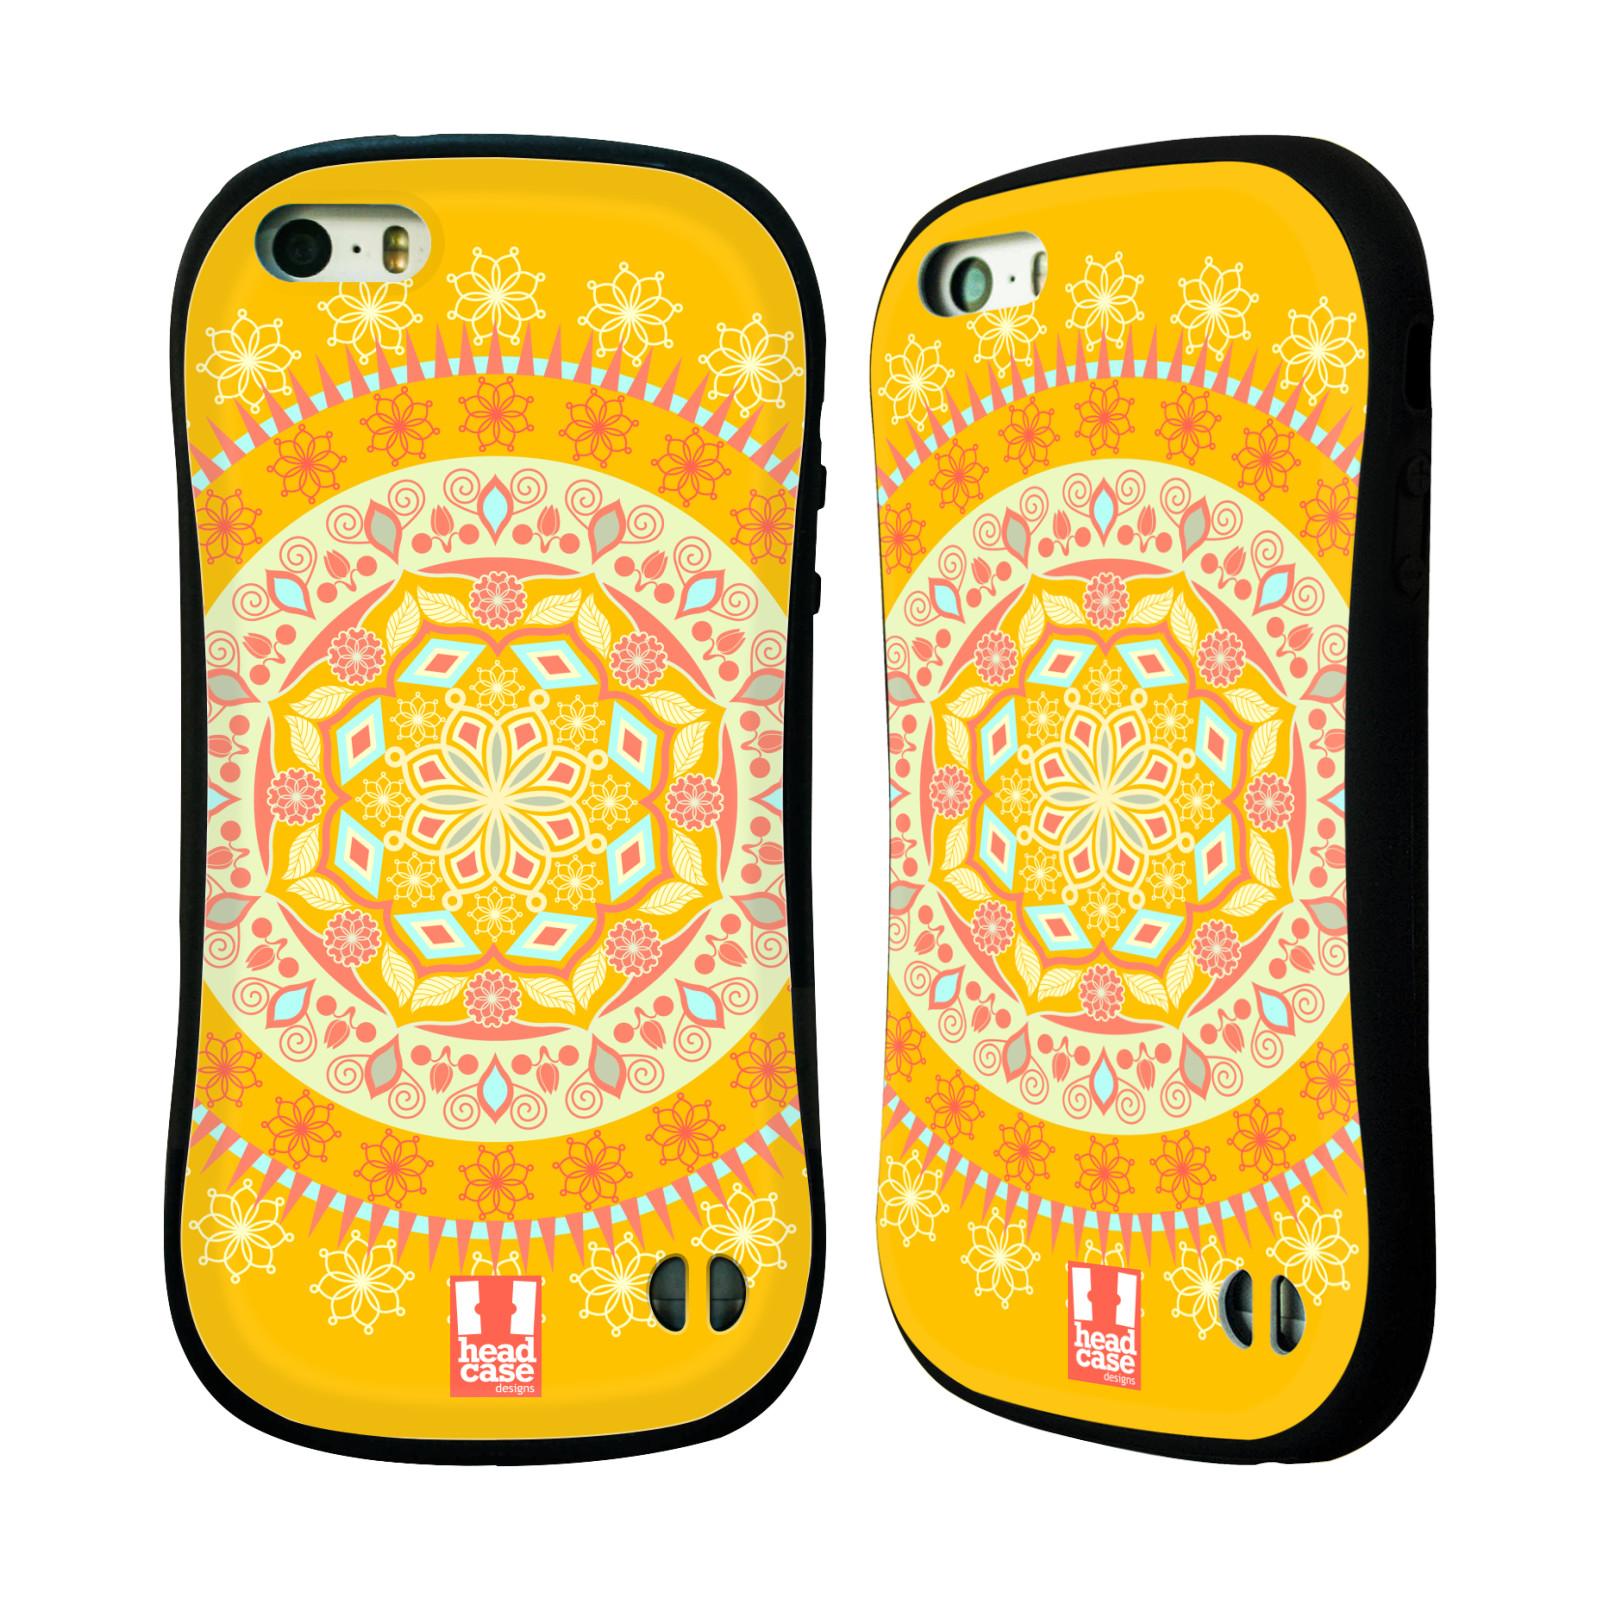 HEAD CASE silikon plast odolný obal na mobil Apple Iphone 5 5S vzor Indie  Mandala slunce barevný motiv ŽLUTÁ 0357af1ee61